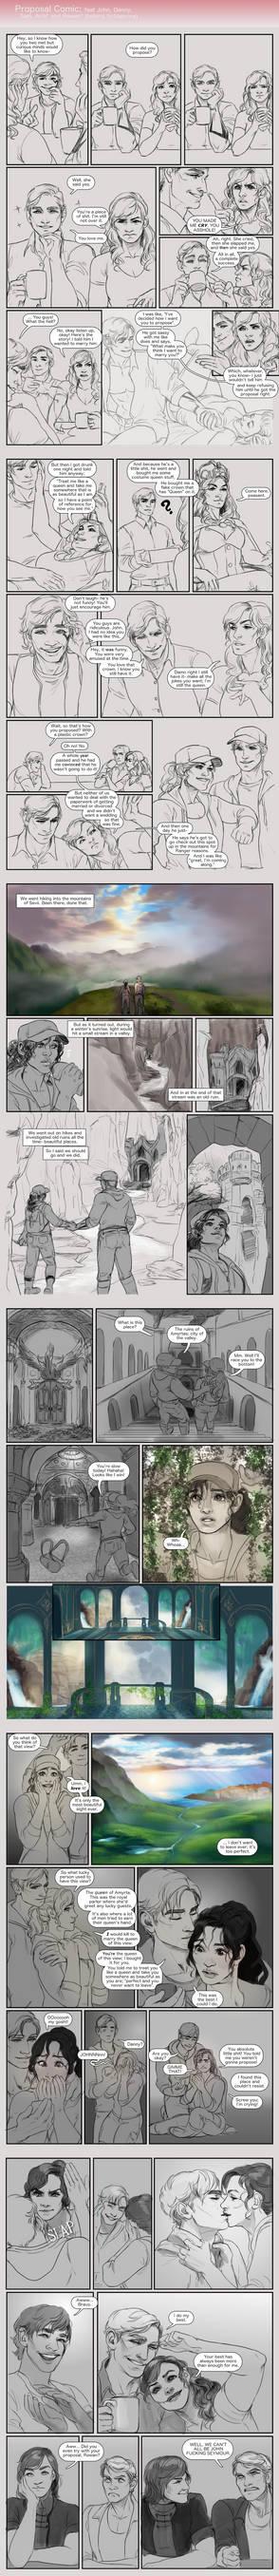 Proposal Comic